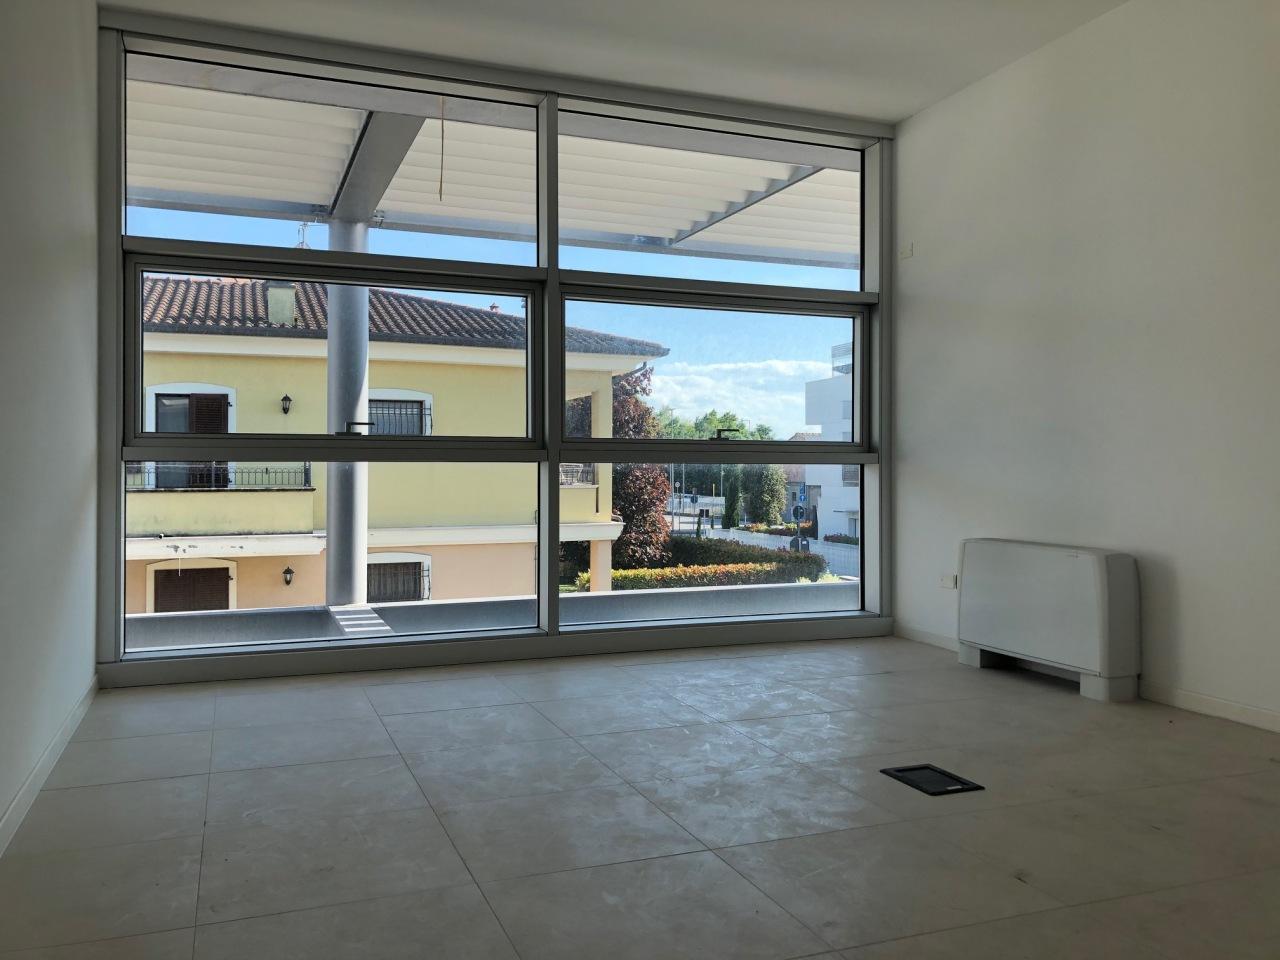 UFFICIO a Santarcangelo di Romagna Rif. 10339409